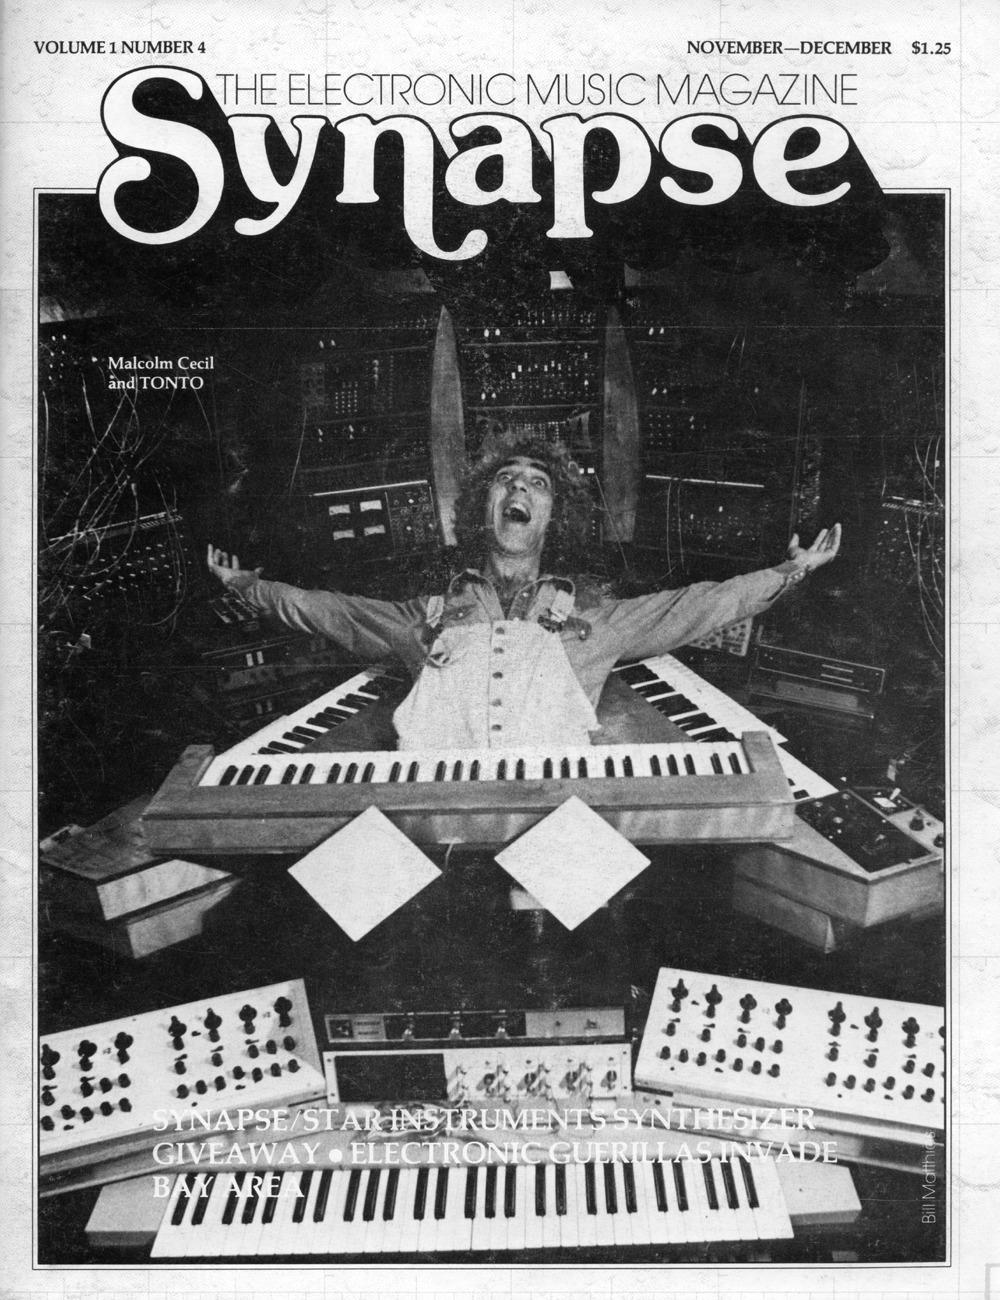 Synapse: The Electronic Music Magazine (1976-1979) — Monoskop Log